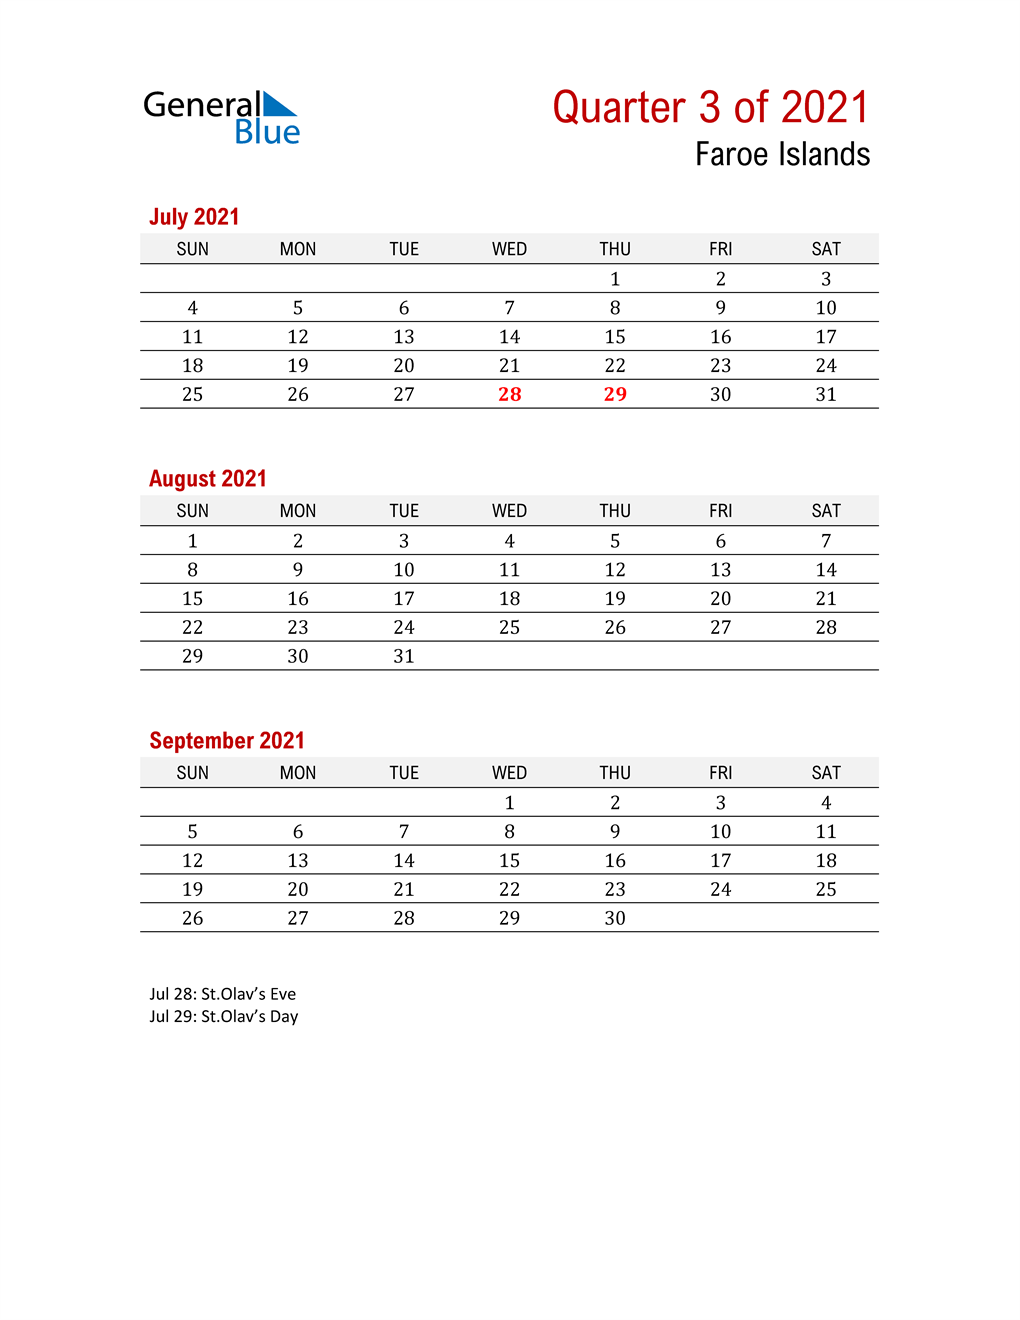 Printable Three Month Calendar for Faroe Islands